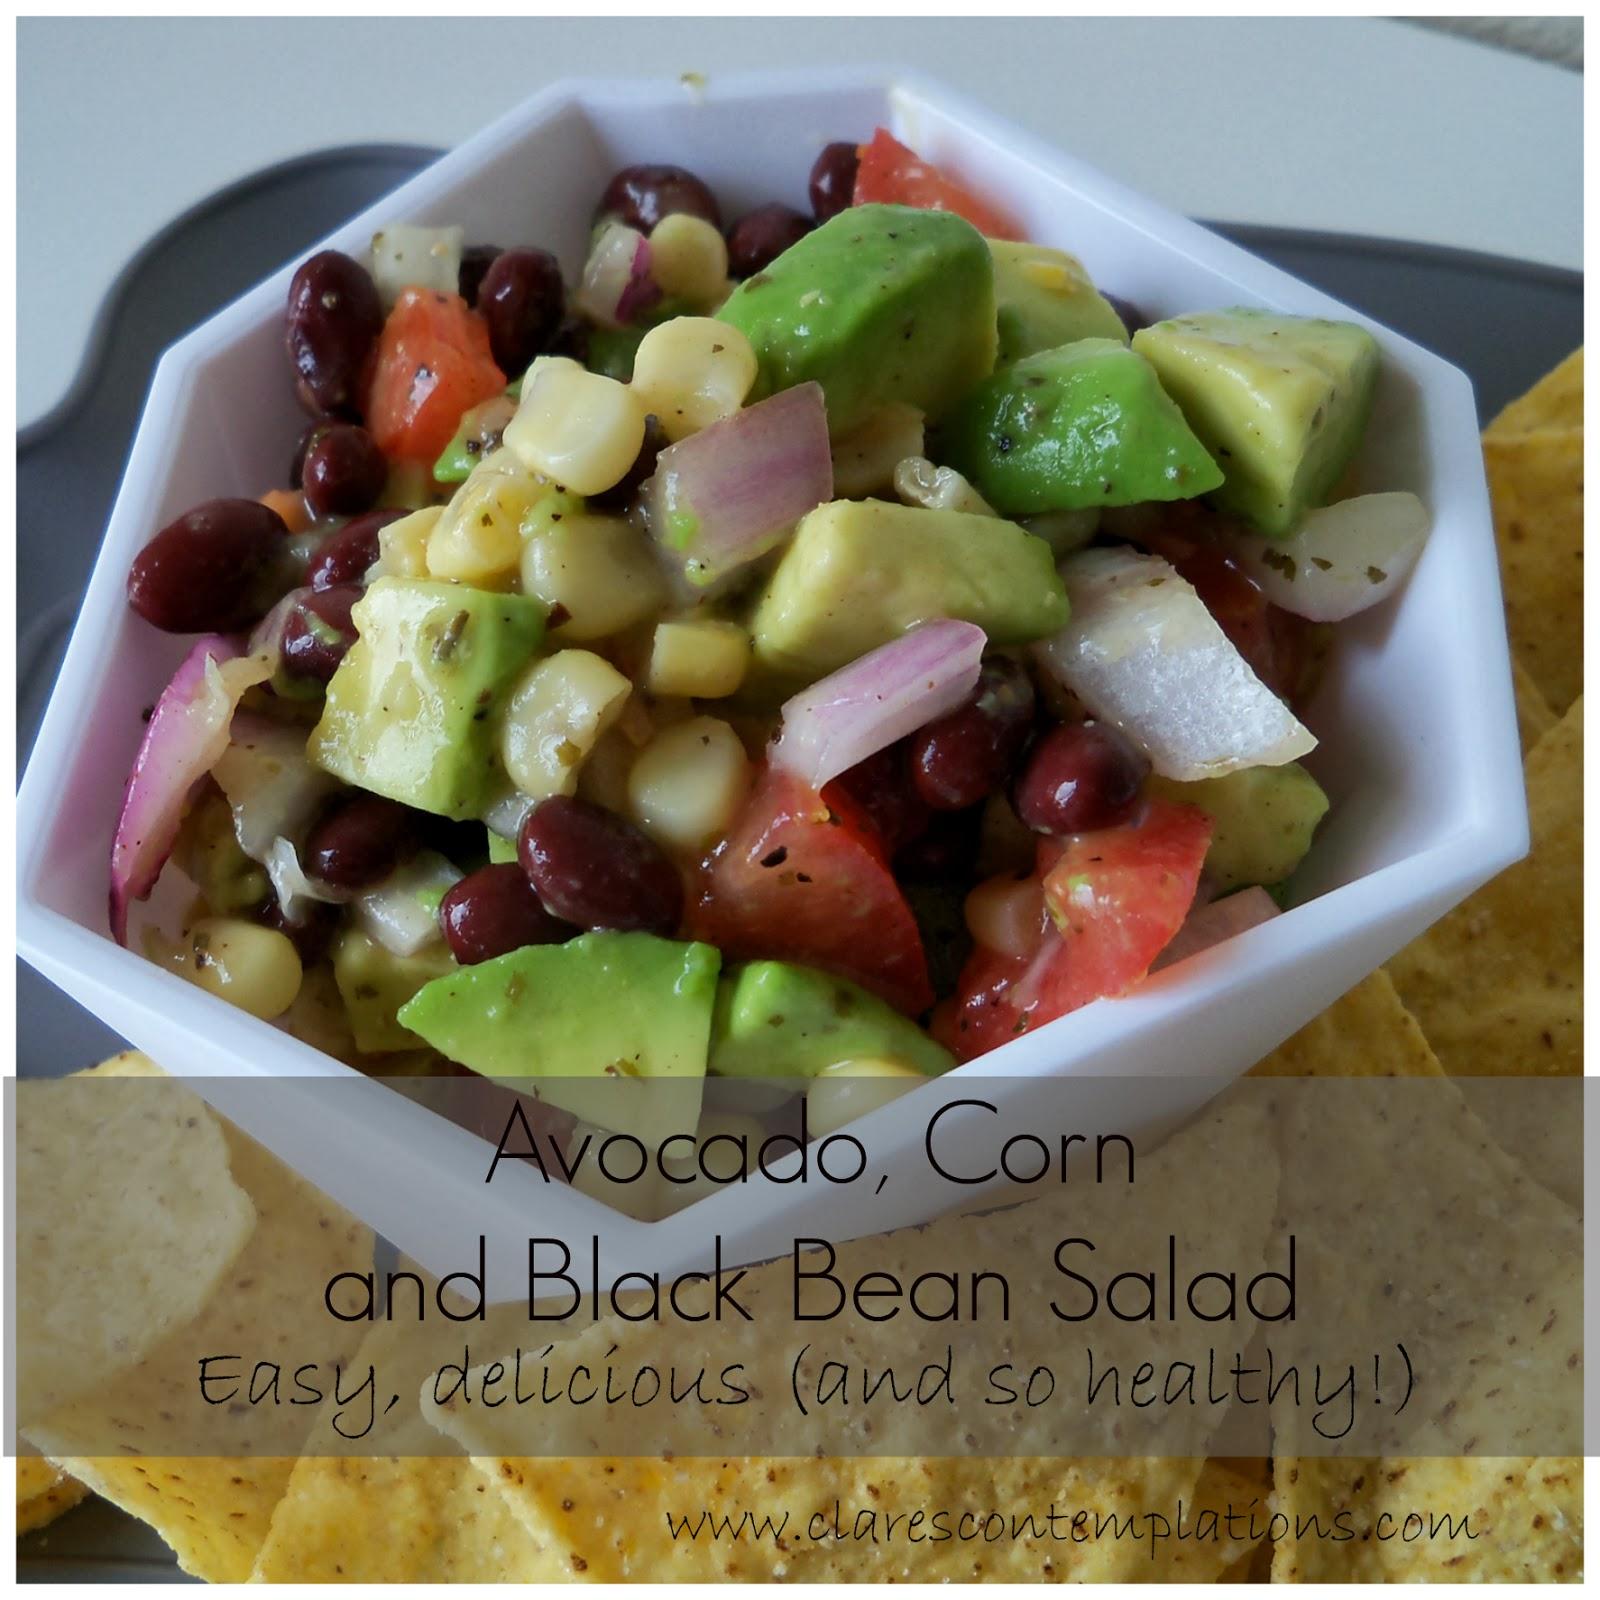 Clare's Contemplations: Avocado, Corn and Black Bean Salad